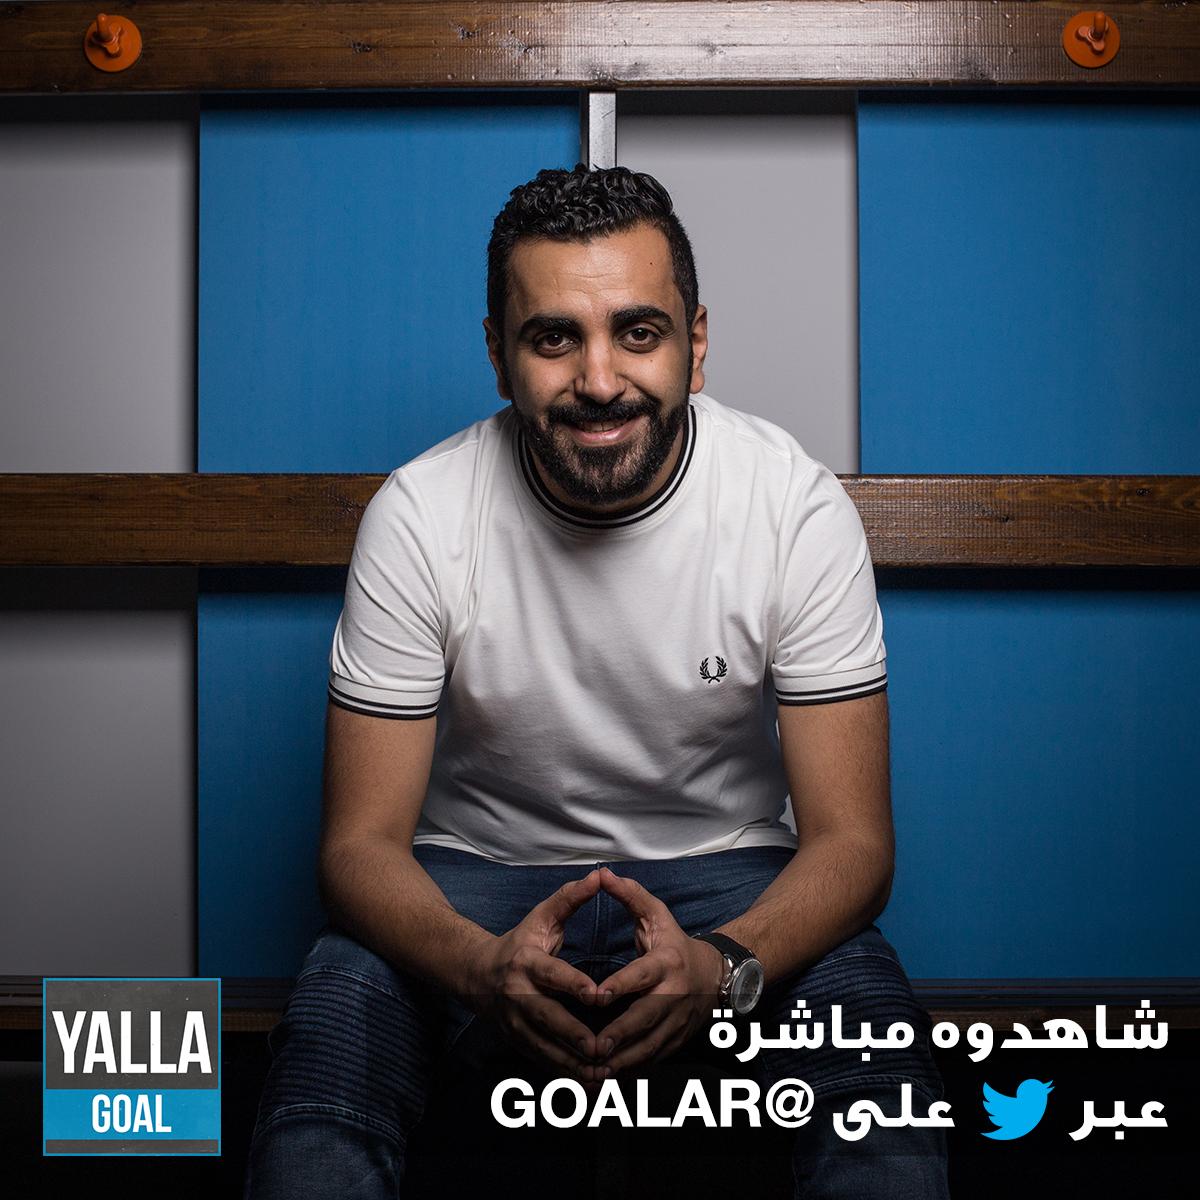 Yalla goal Aziz